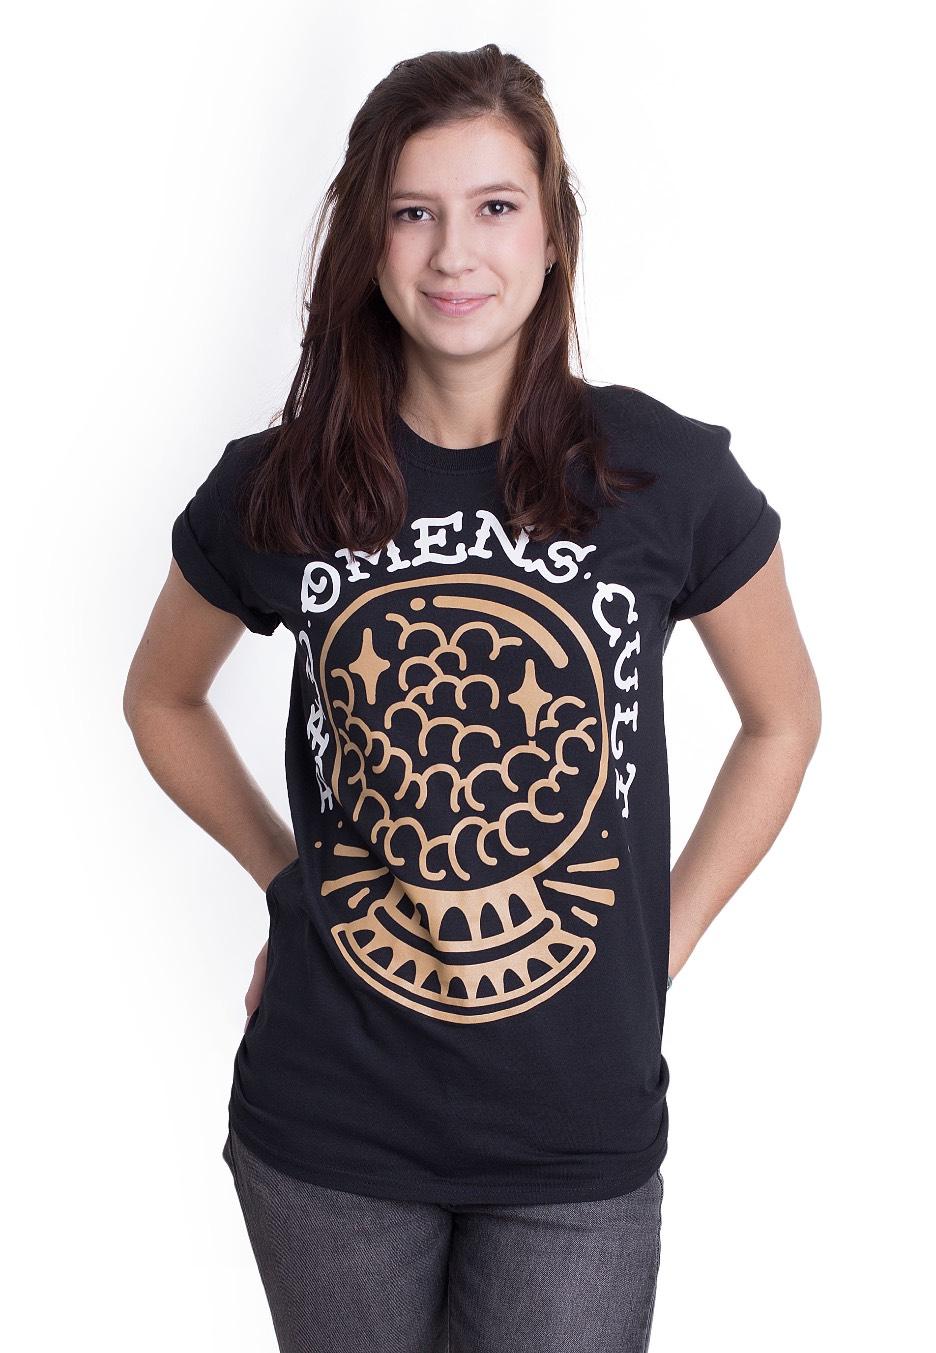 Bad Omens - Crystal Ball - T-Shirt - Post Metalcore ...